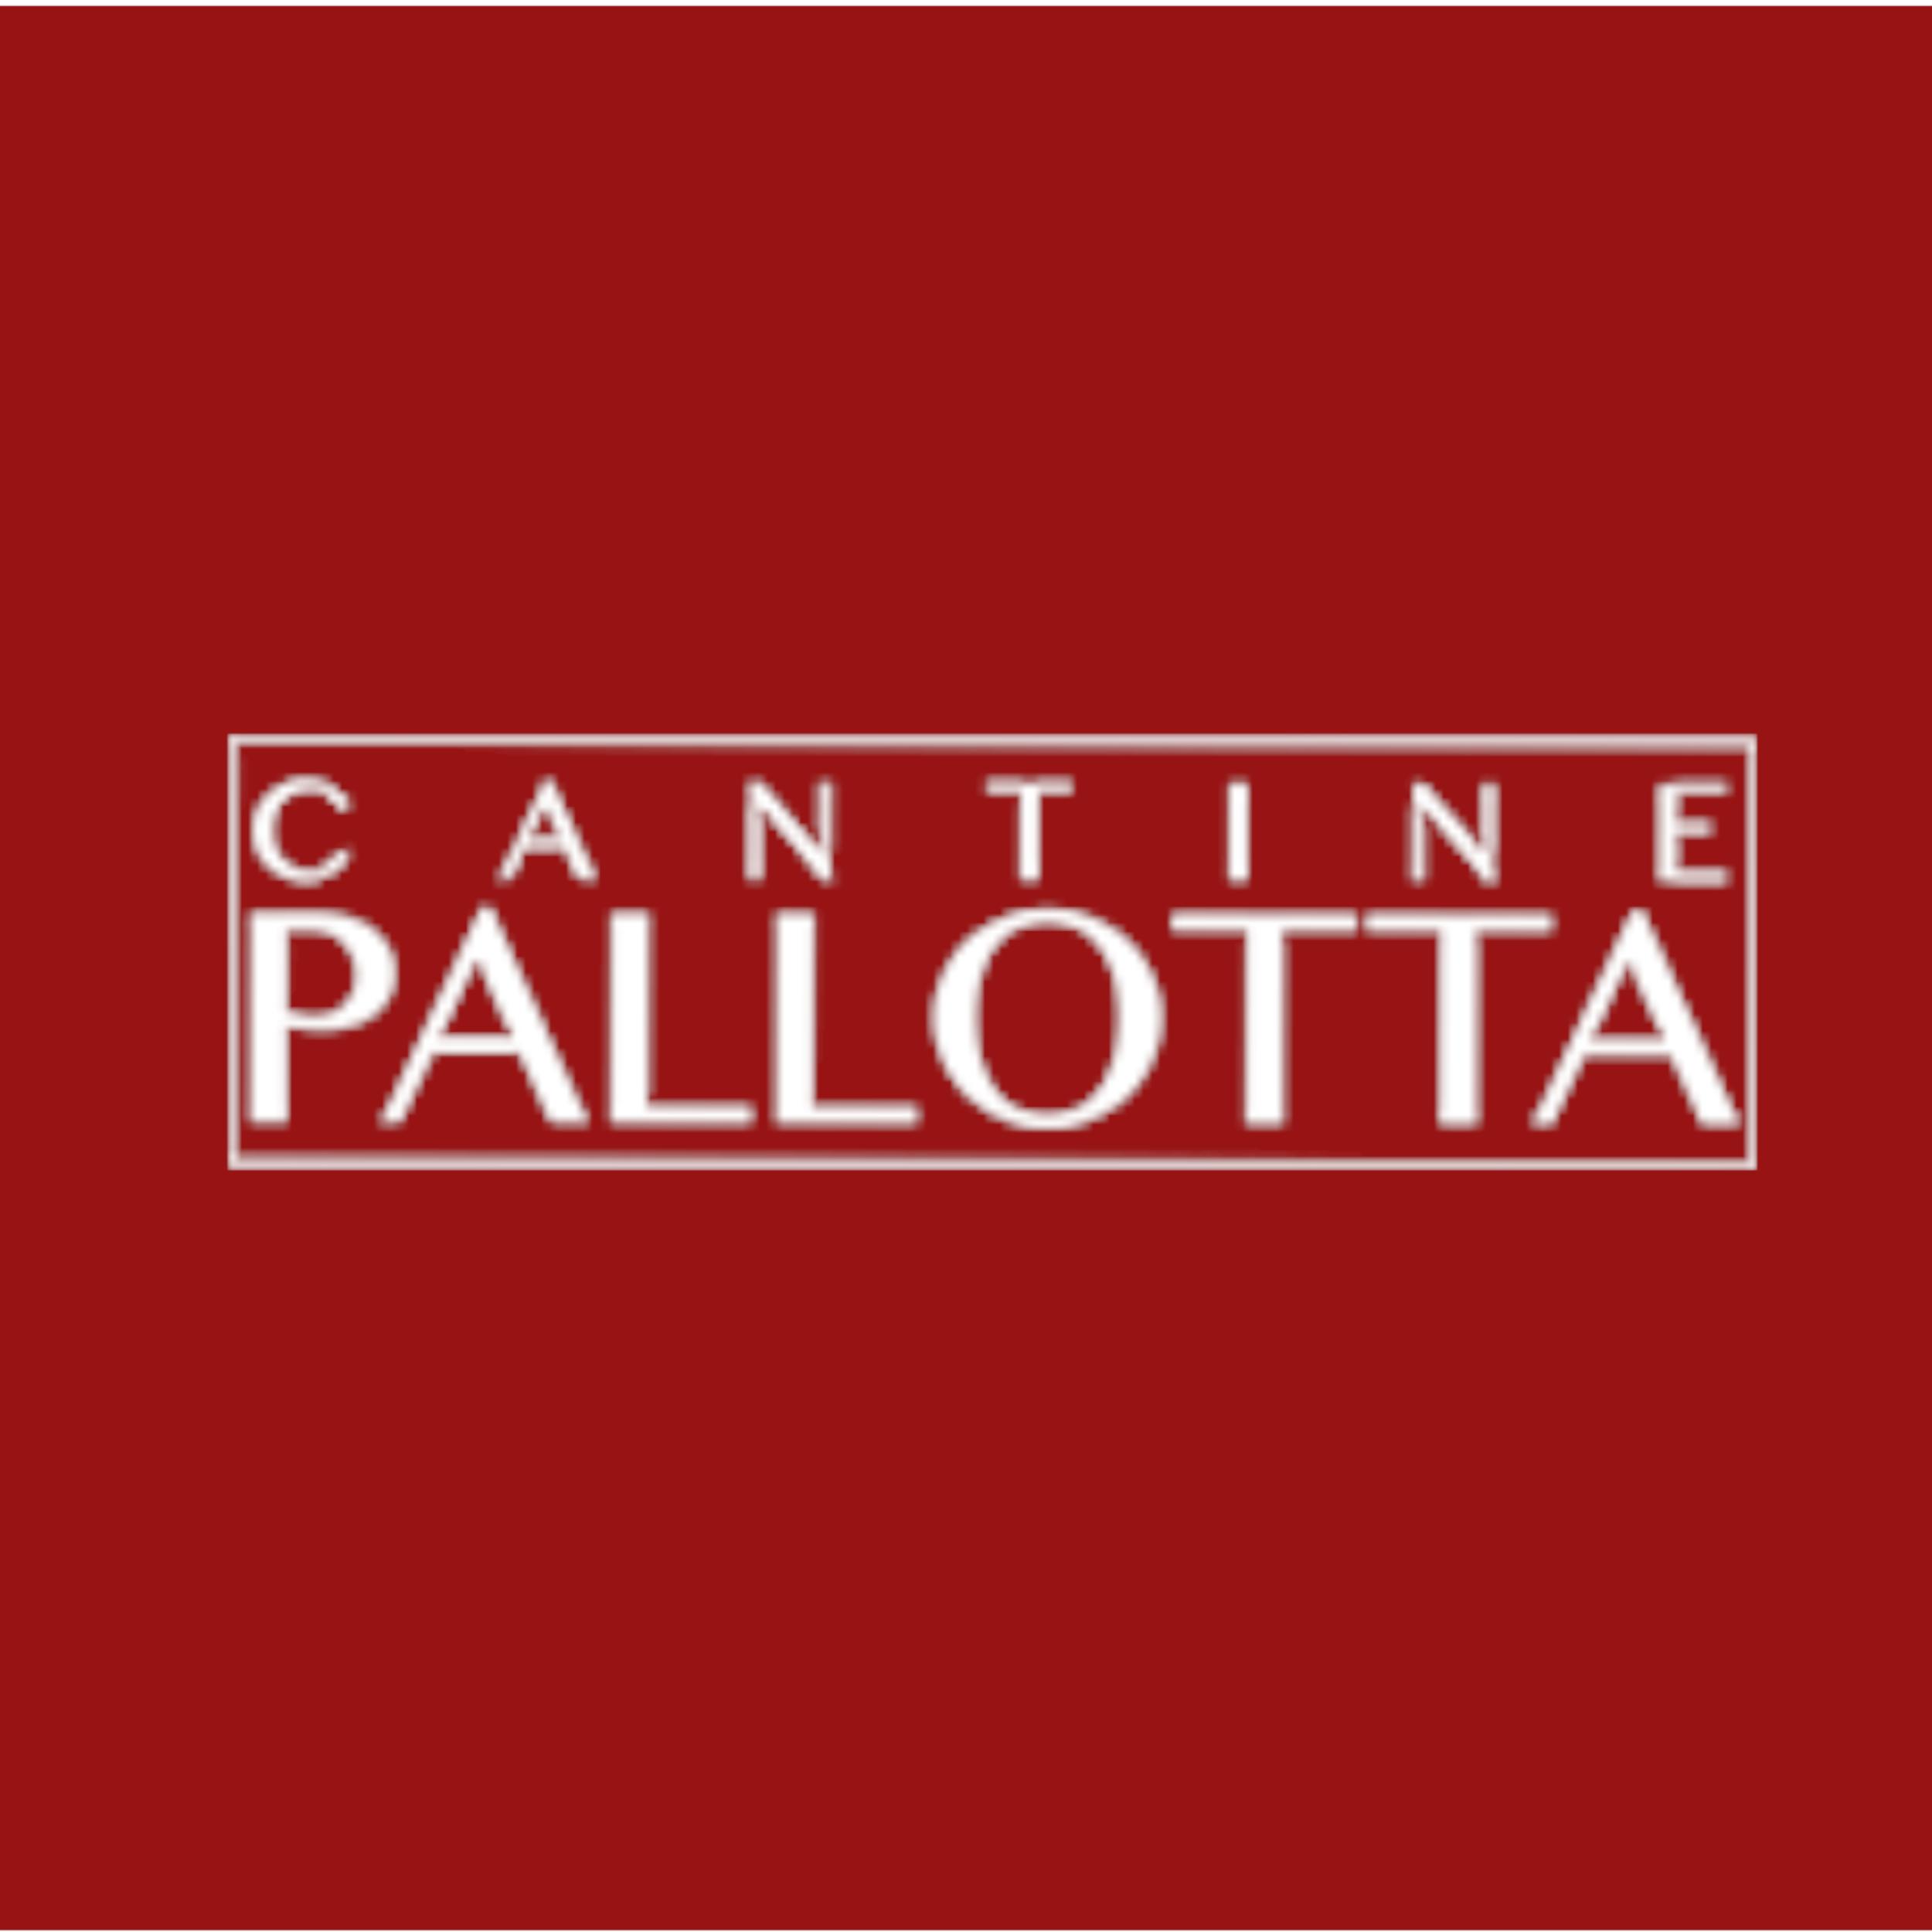 CANTINE PALLOTTA